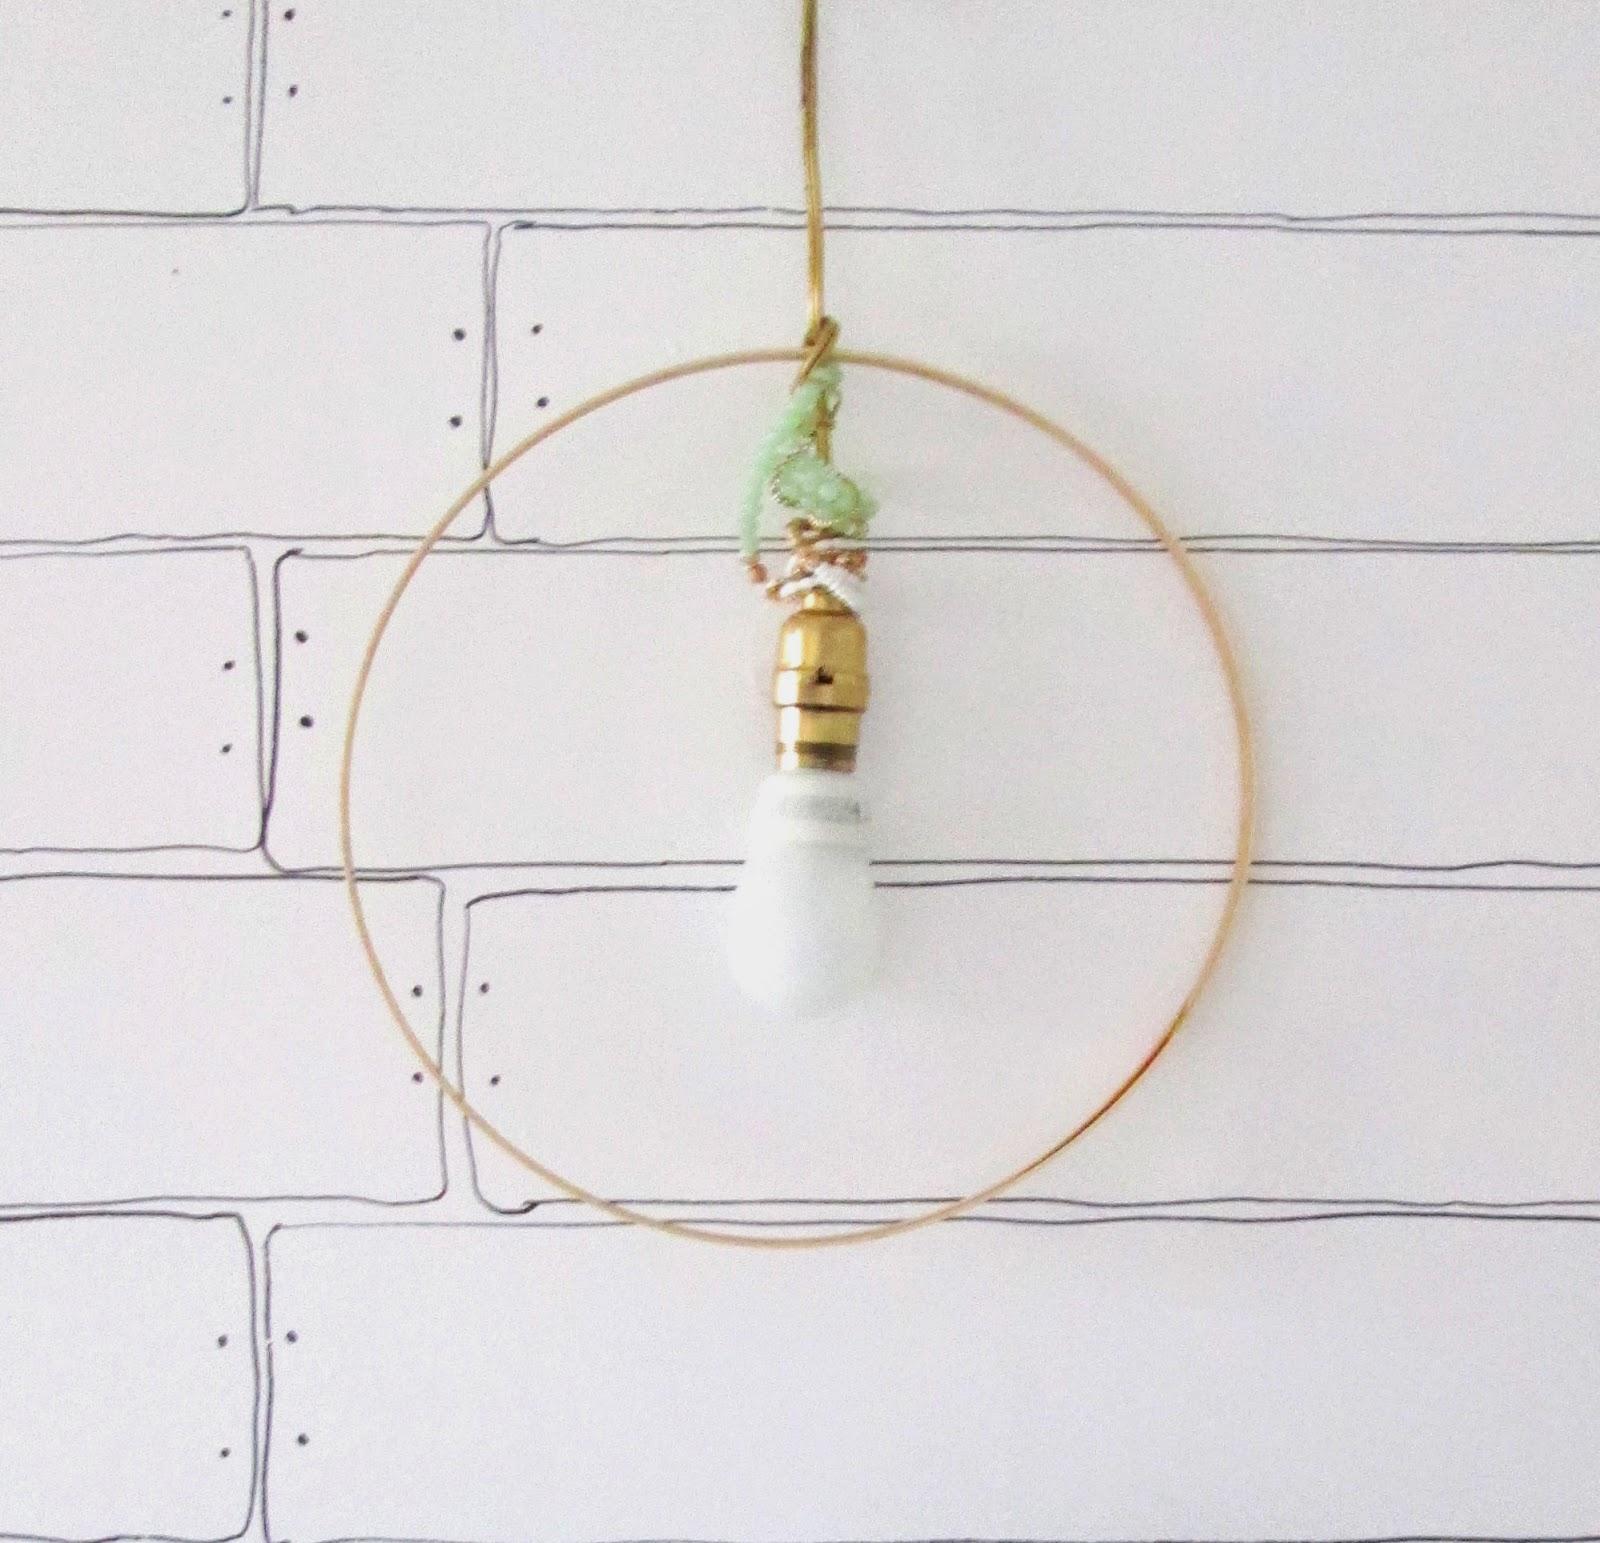 hung+light9.jpg